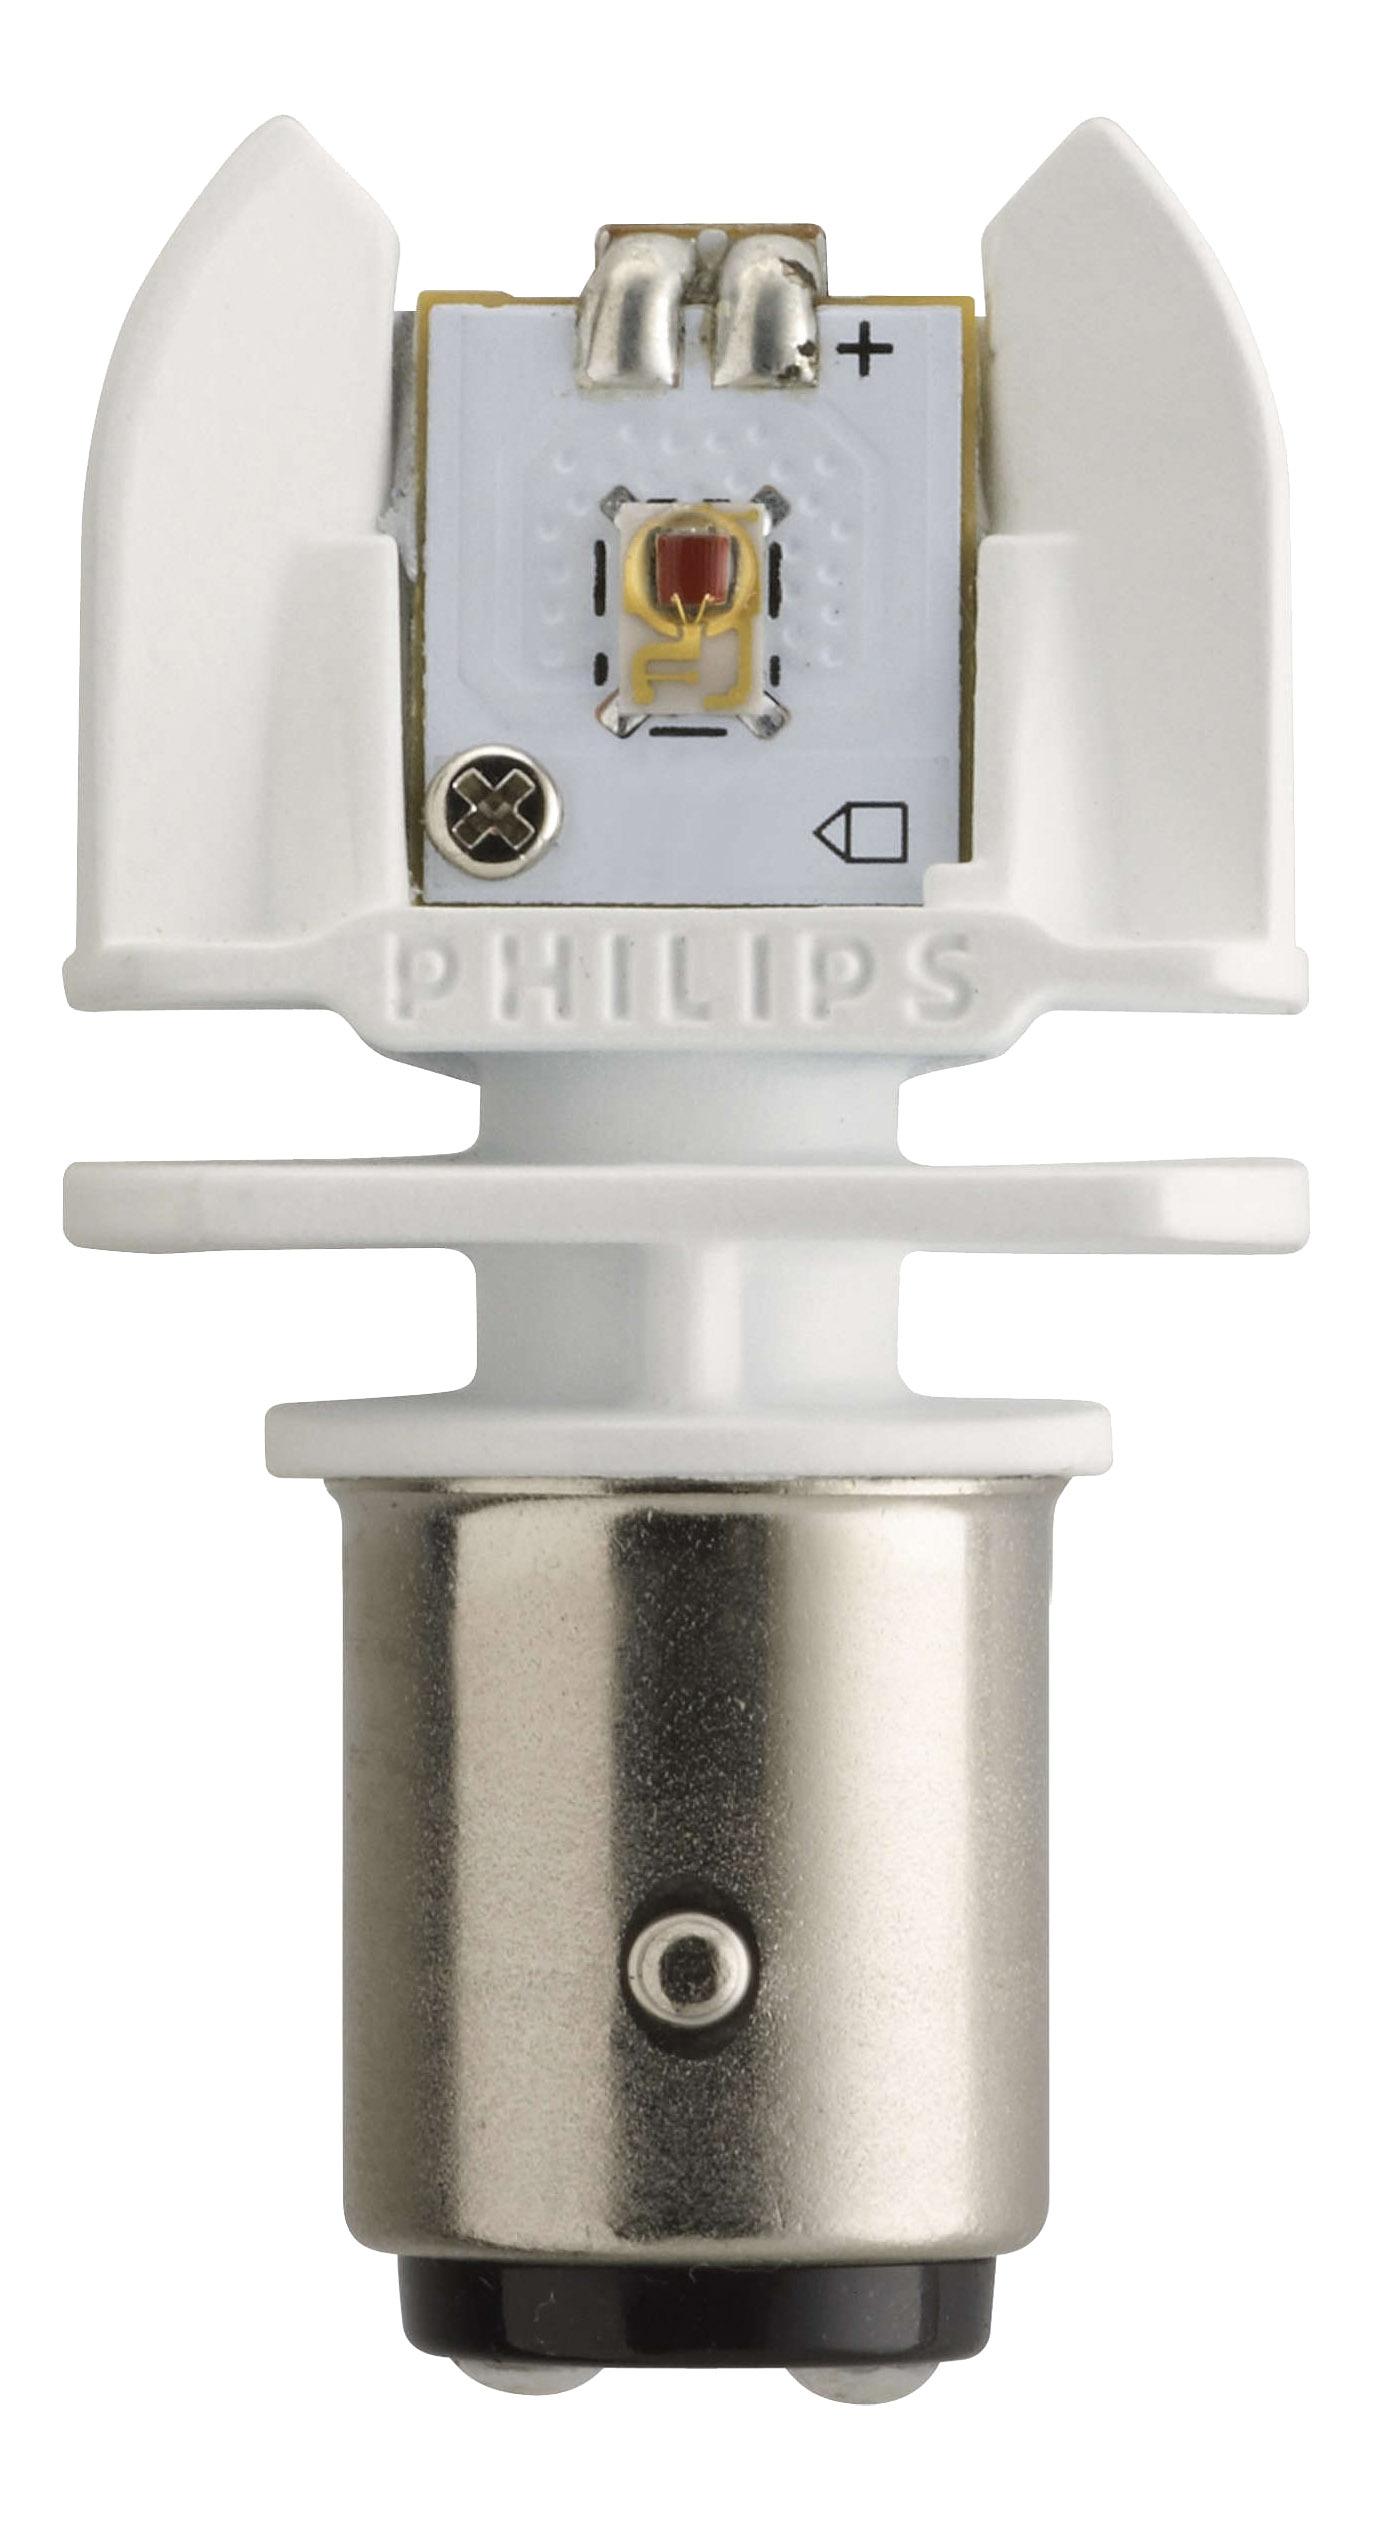 Лампа светодиодная PHILIPS X-tremeUltinon 5W BAY15d 12899RX2 фото